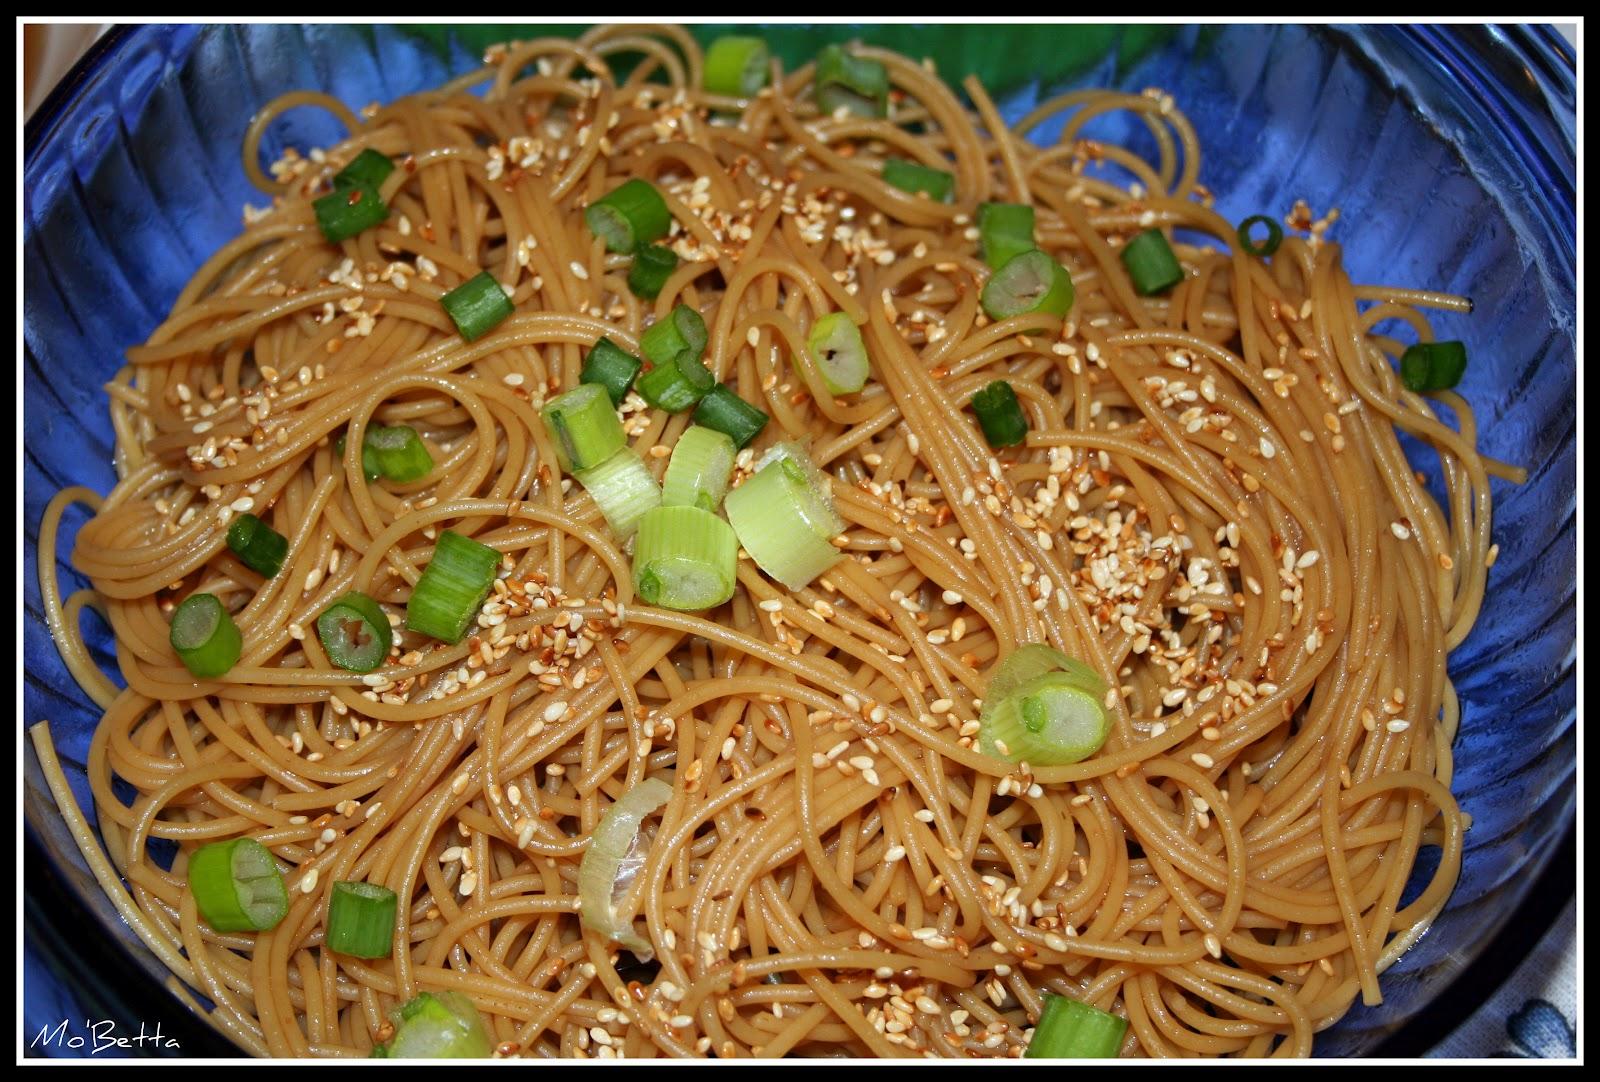 Hibachi Soup and Sesame Noodles – Makin' it Mo'Betta